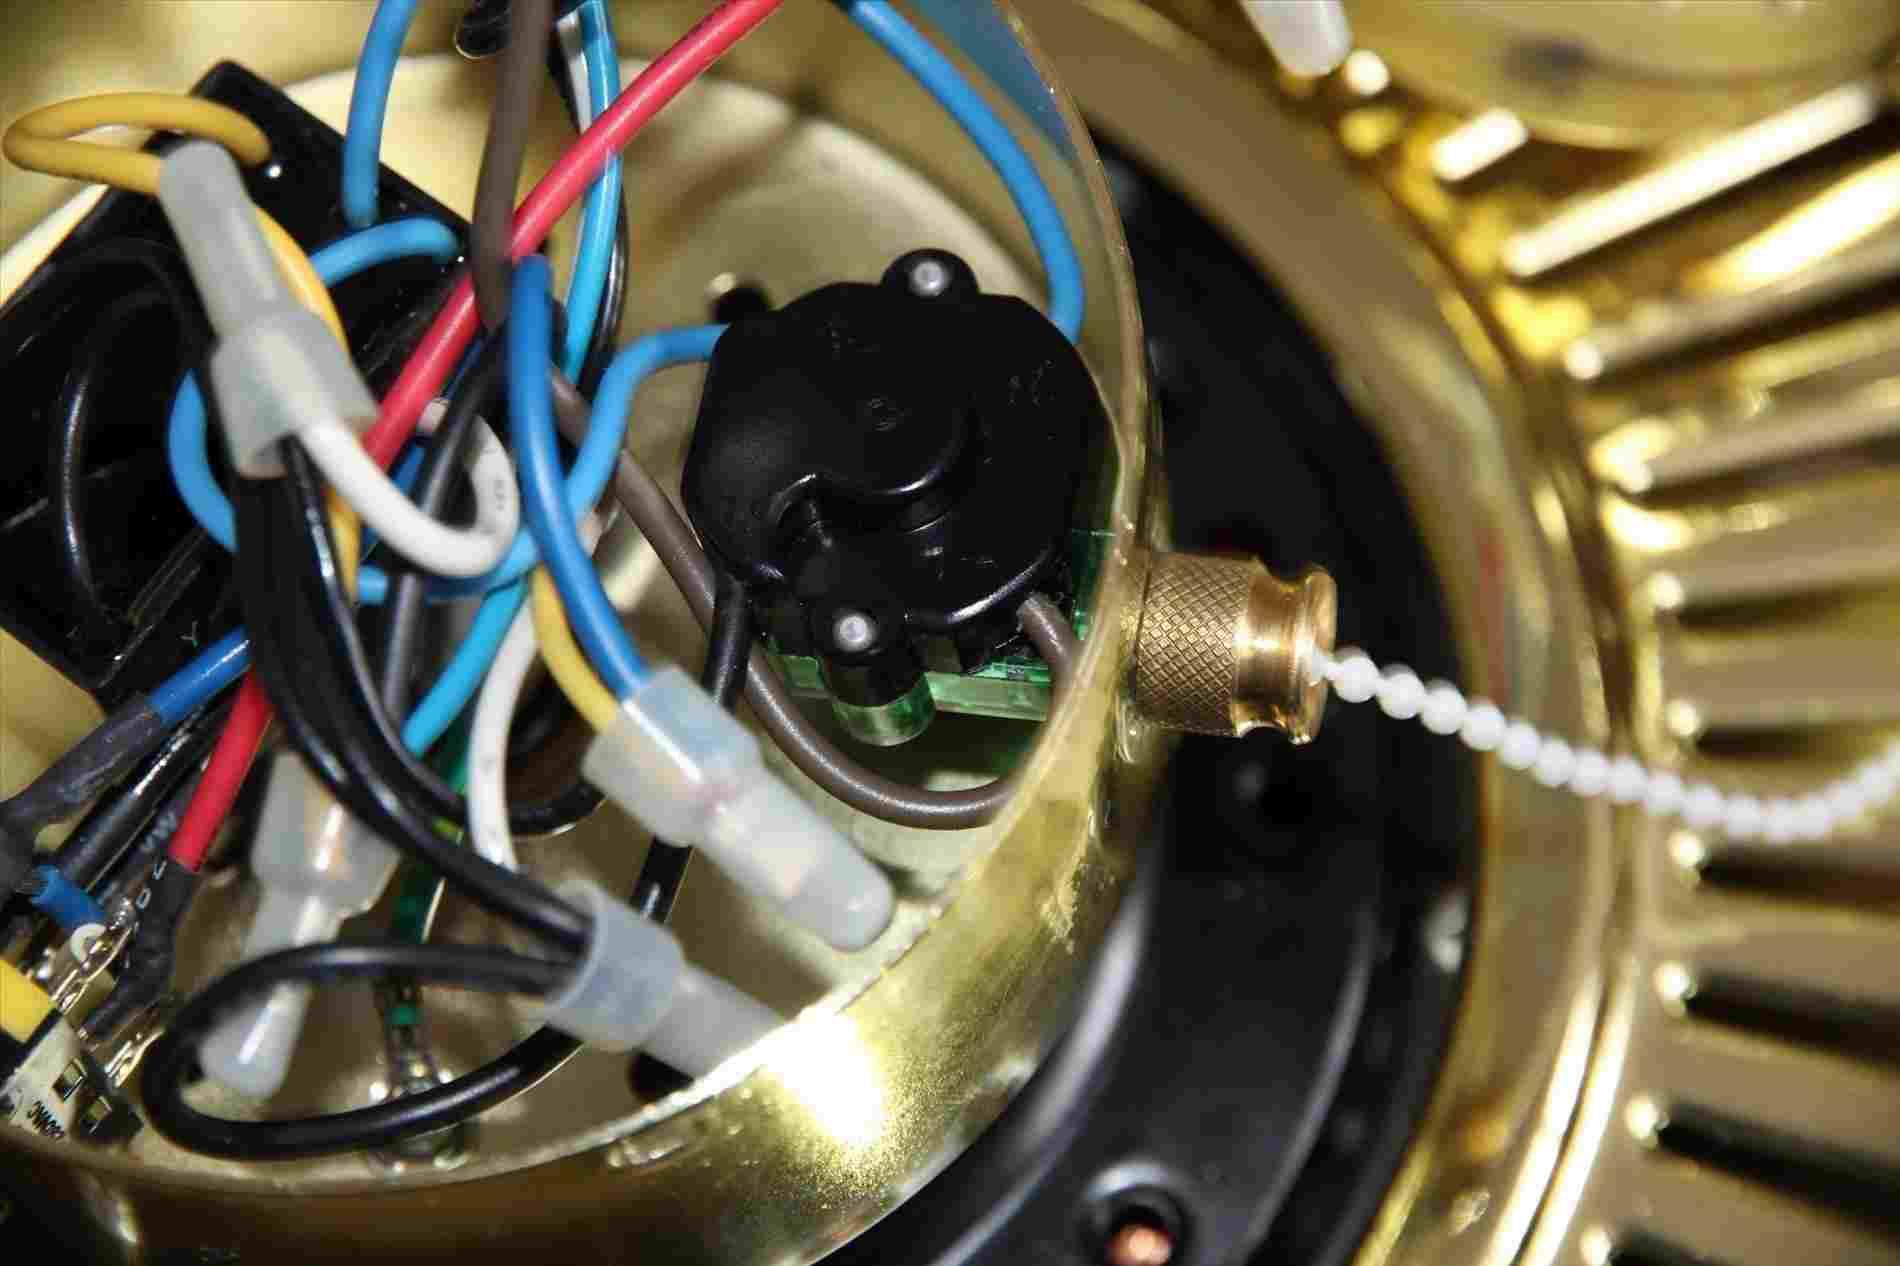 Wiring-Hunter-Ceiling-Fan-Pull-Chain-Light-Switch-Diagram-Fabulous - Ceiling Fan Pull Chain Light Switch Wiring Diagram